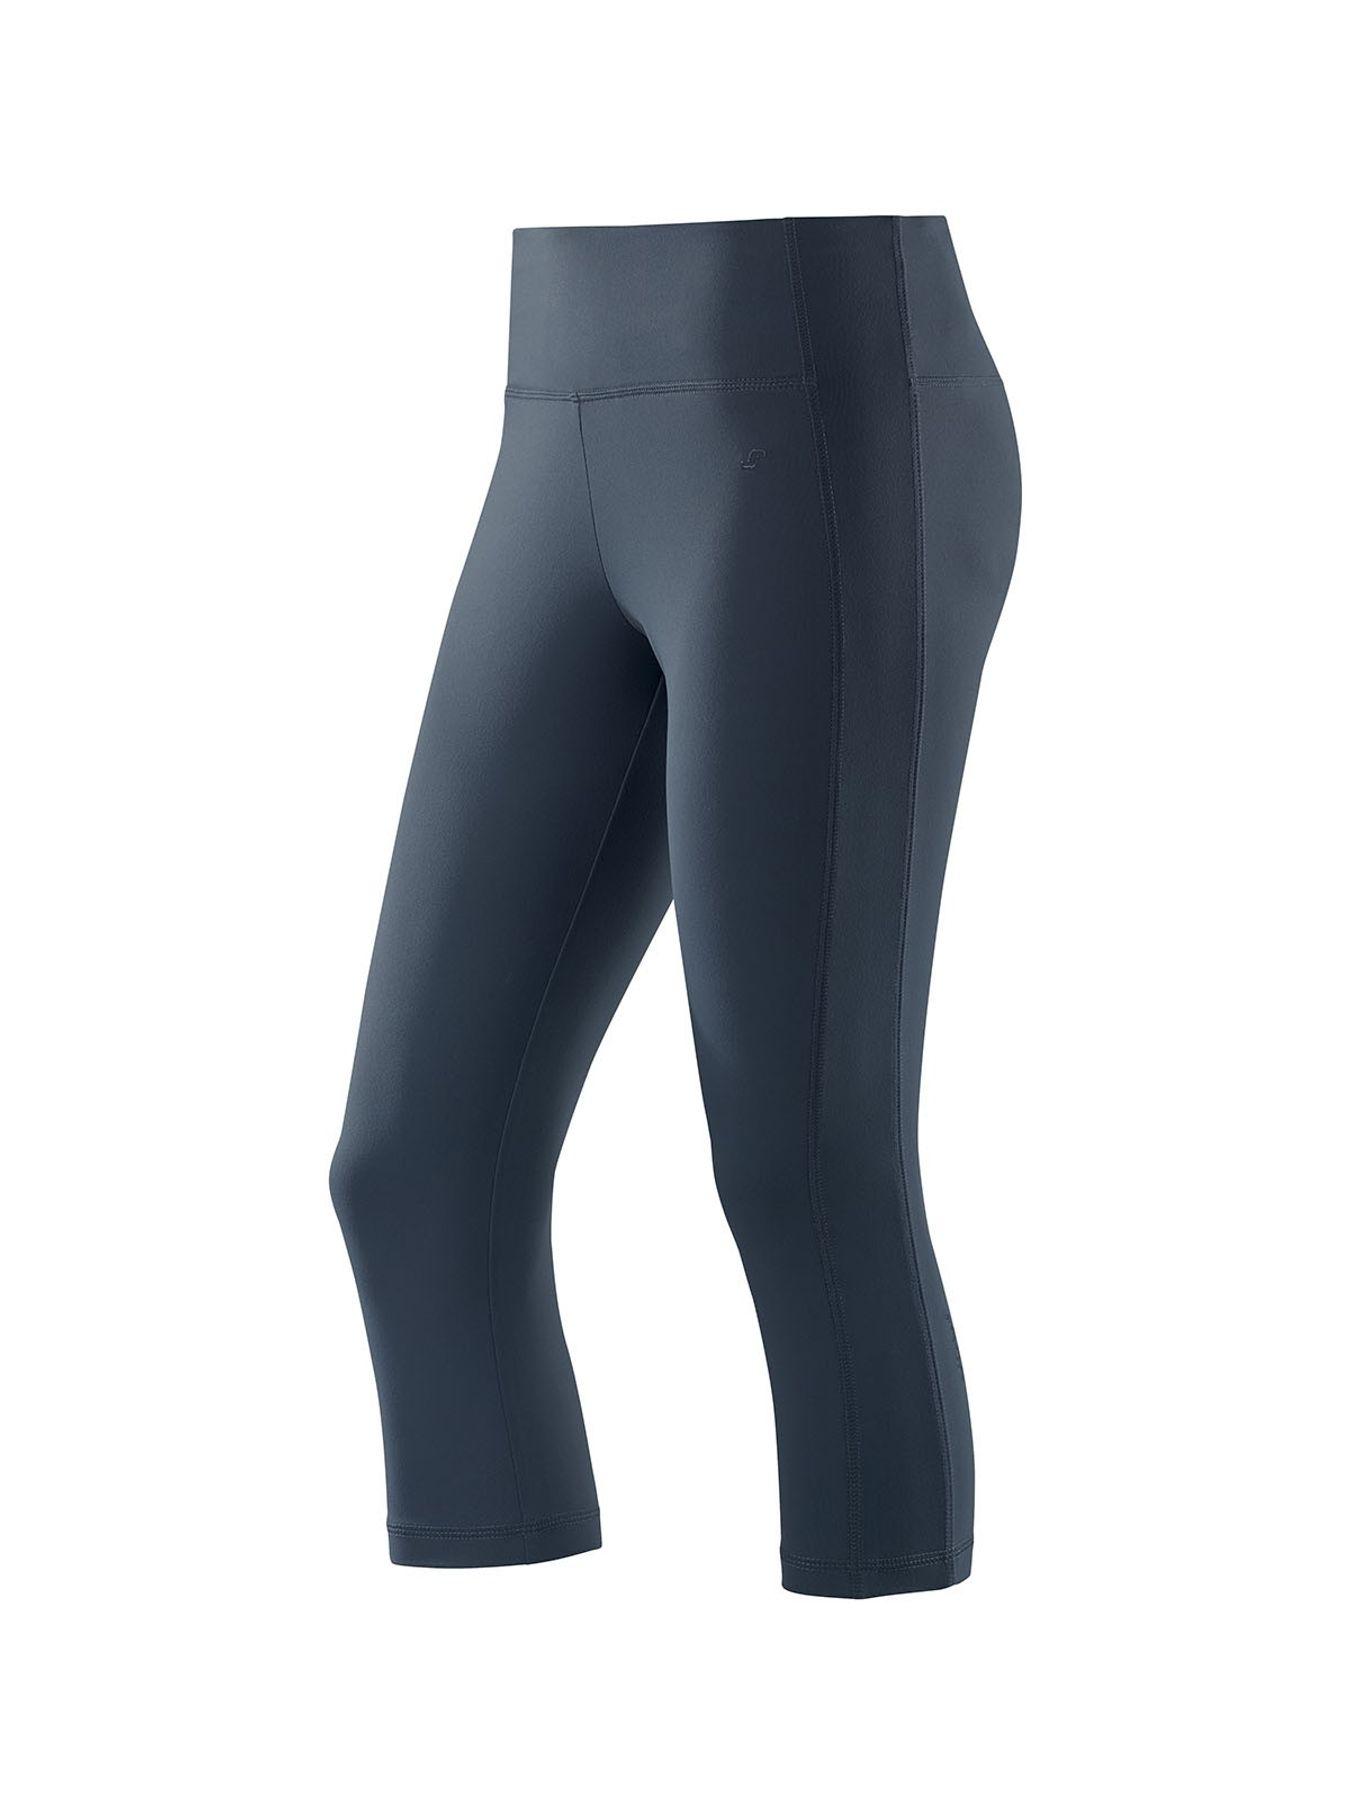 Joy - Bodyfit - Damen 3/4 Hose mit Shaping-Effekt, Susanna (30142) – Bild 1